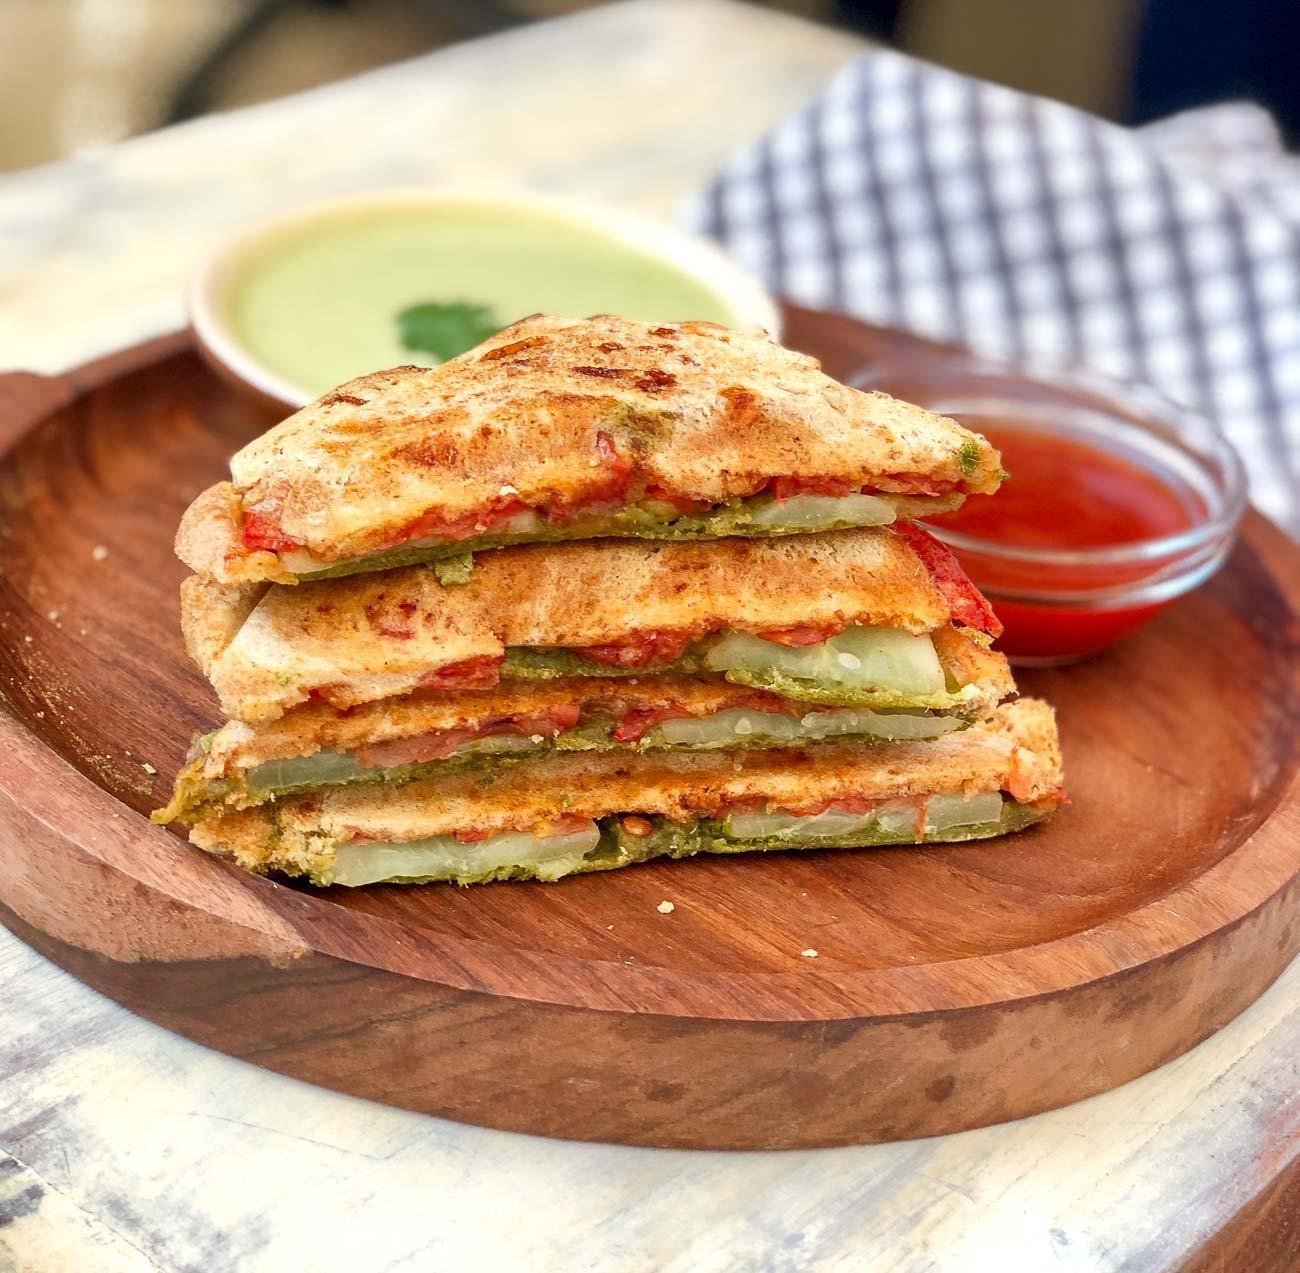 Classic grilled tomato cucumber chutney sandwich recipe by classic grilled tomato cucumber chutney sandwich recipe forumfinder Gallery